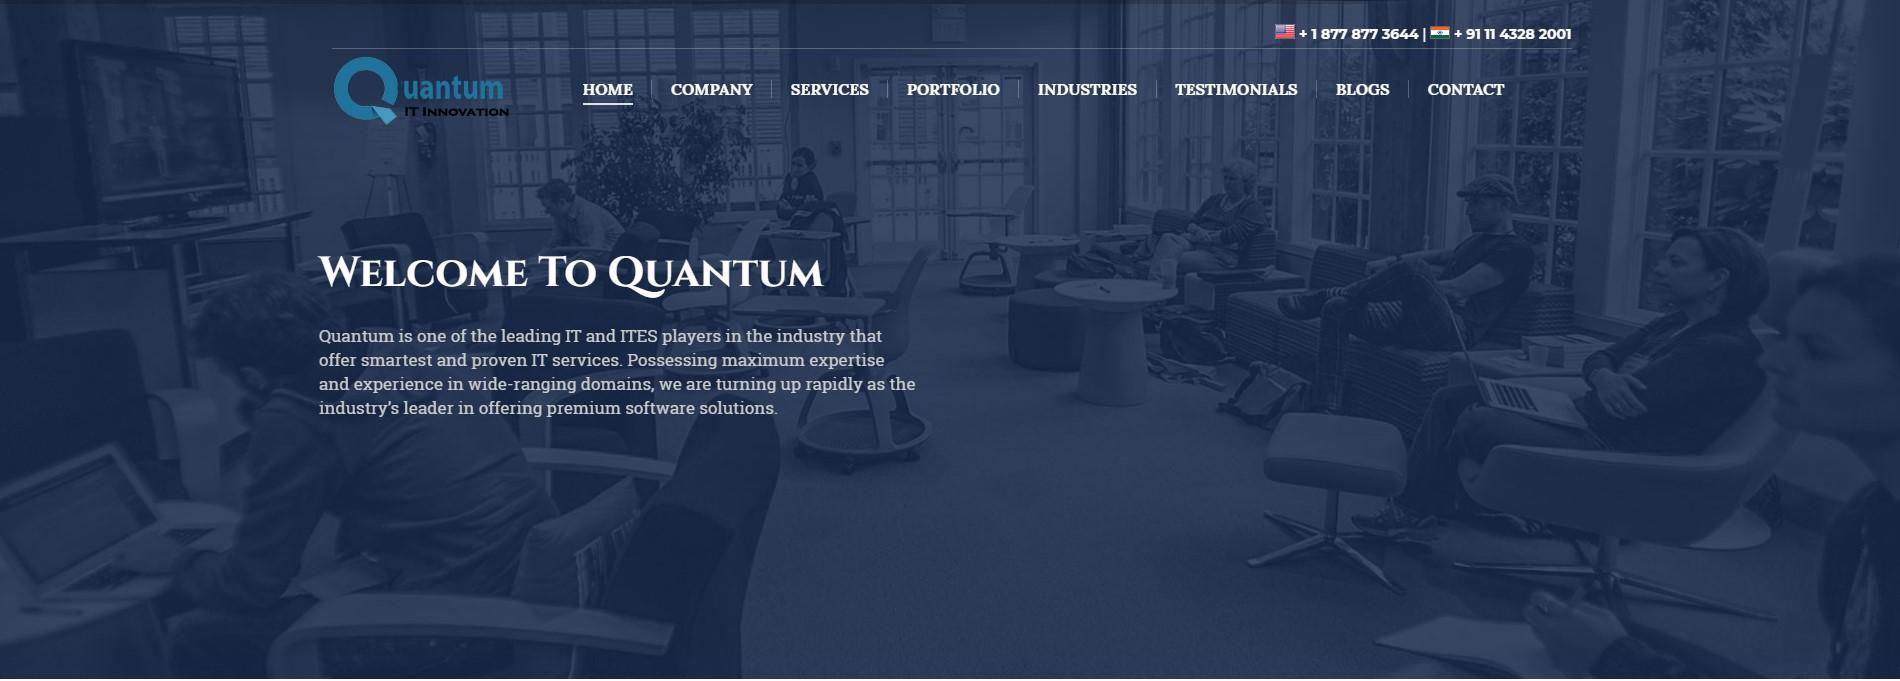 quantumitinnovation